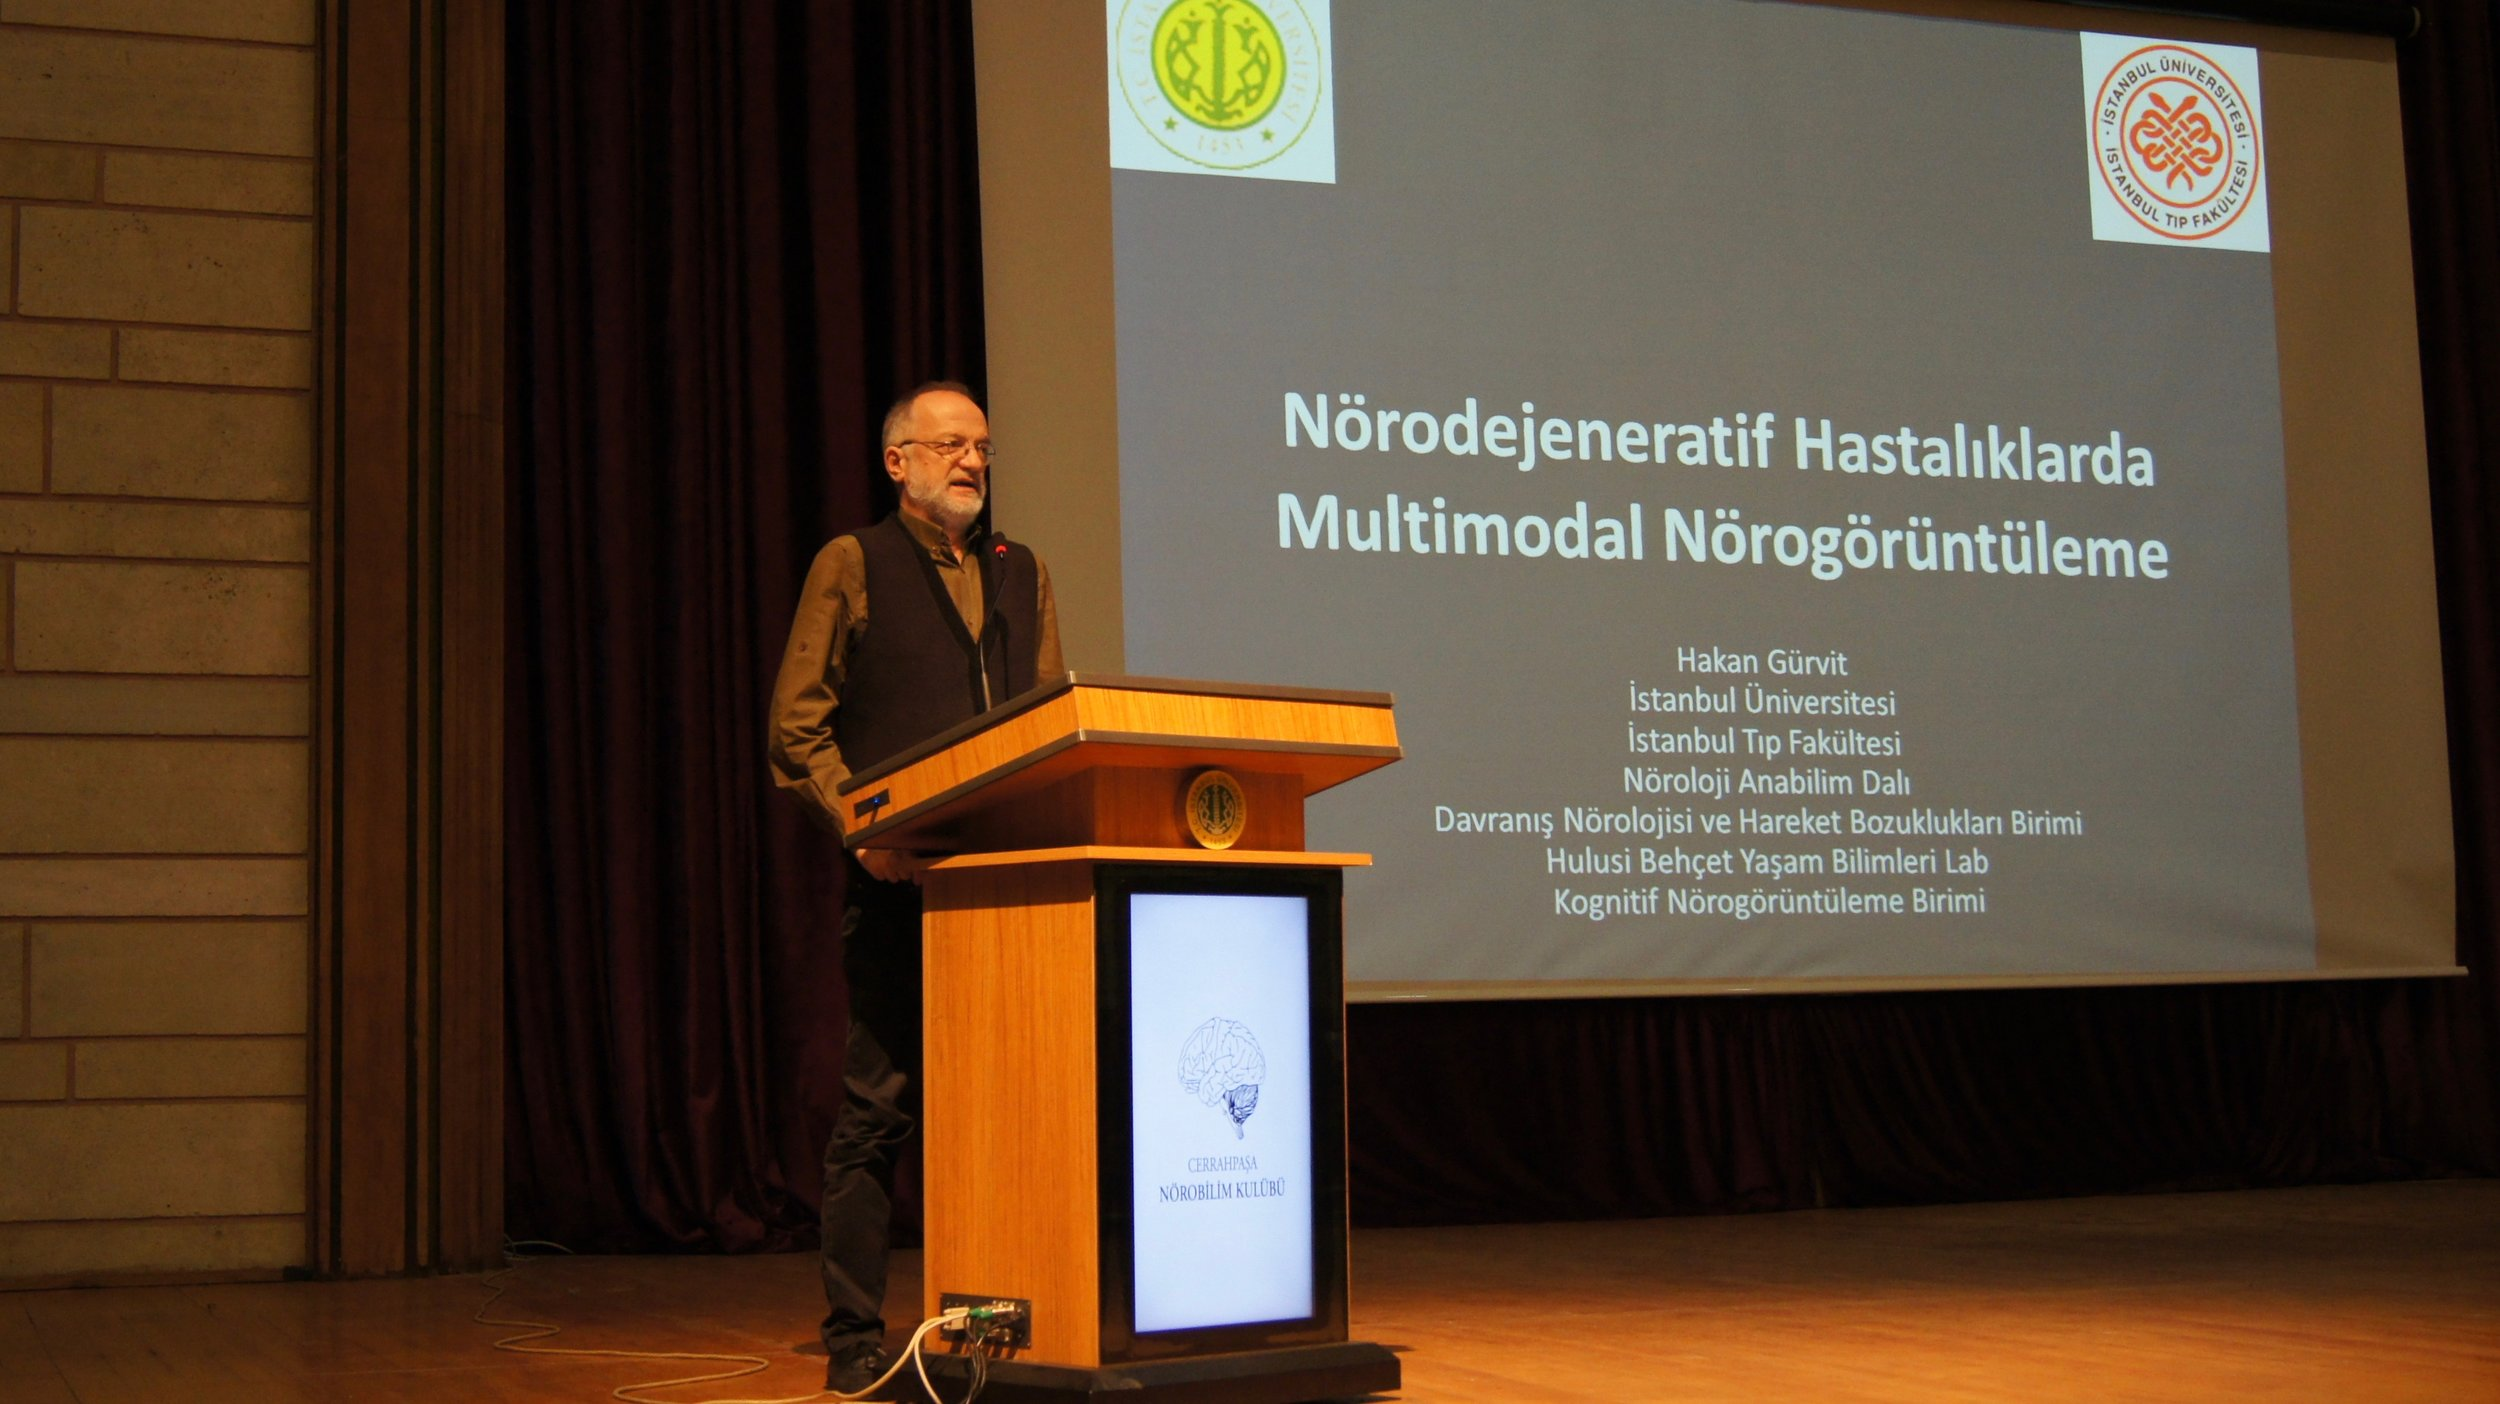 Prof. Dr. Hakan Gürvit